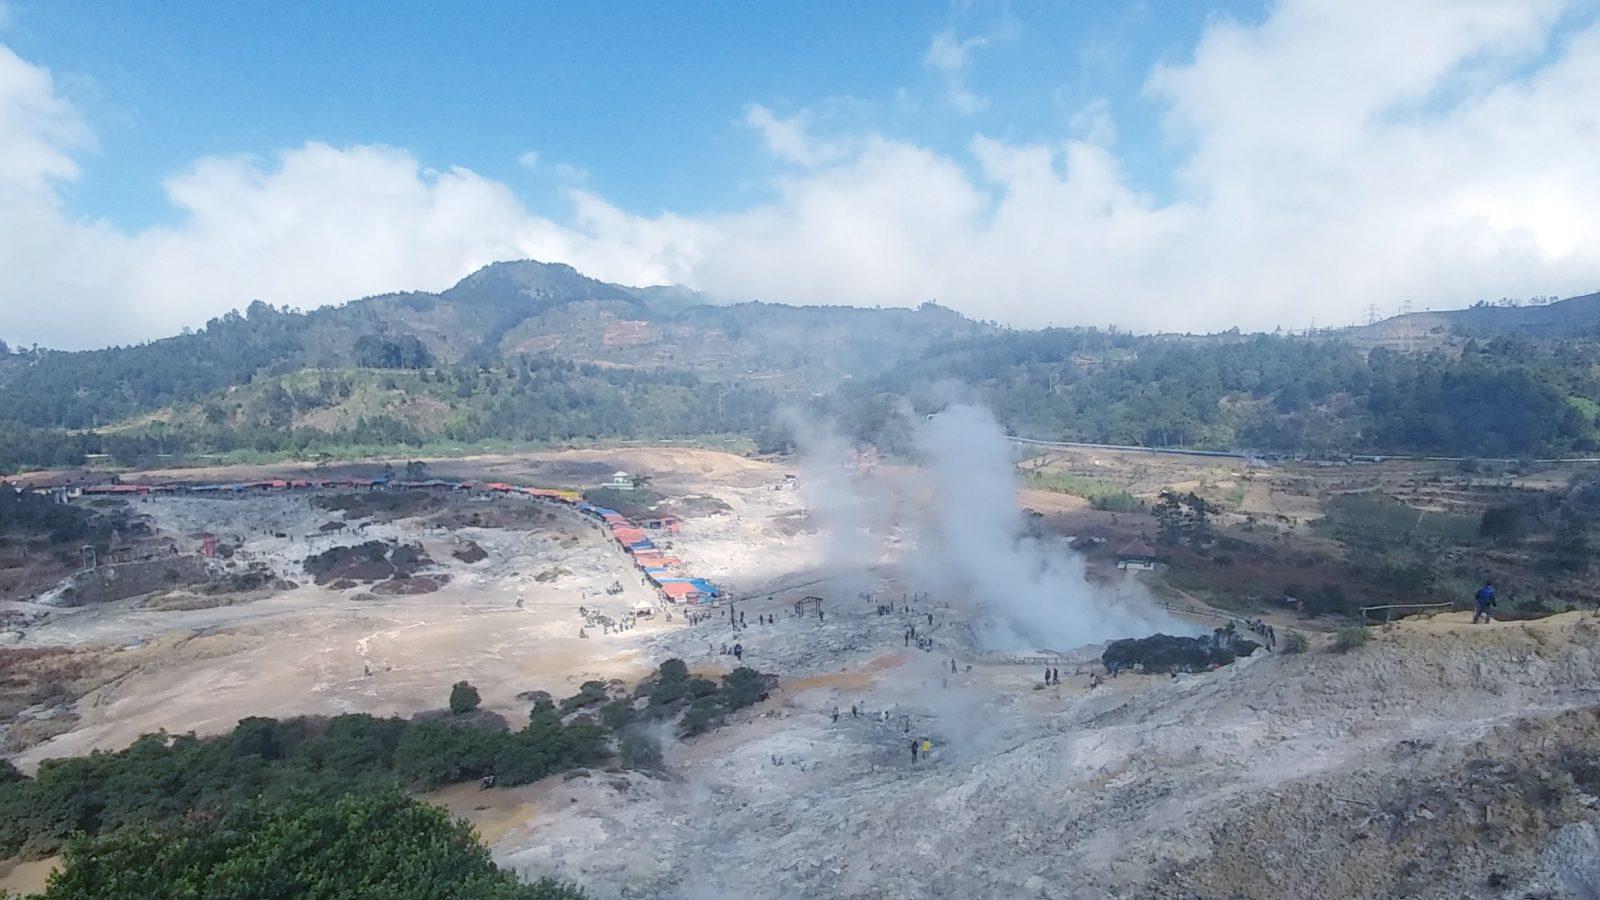 Kawah Sikidang Dieng Tiket & Pesona November 10 - TravelsPromo